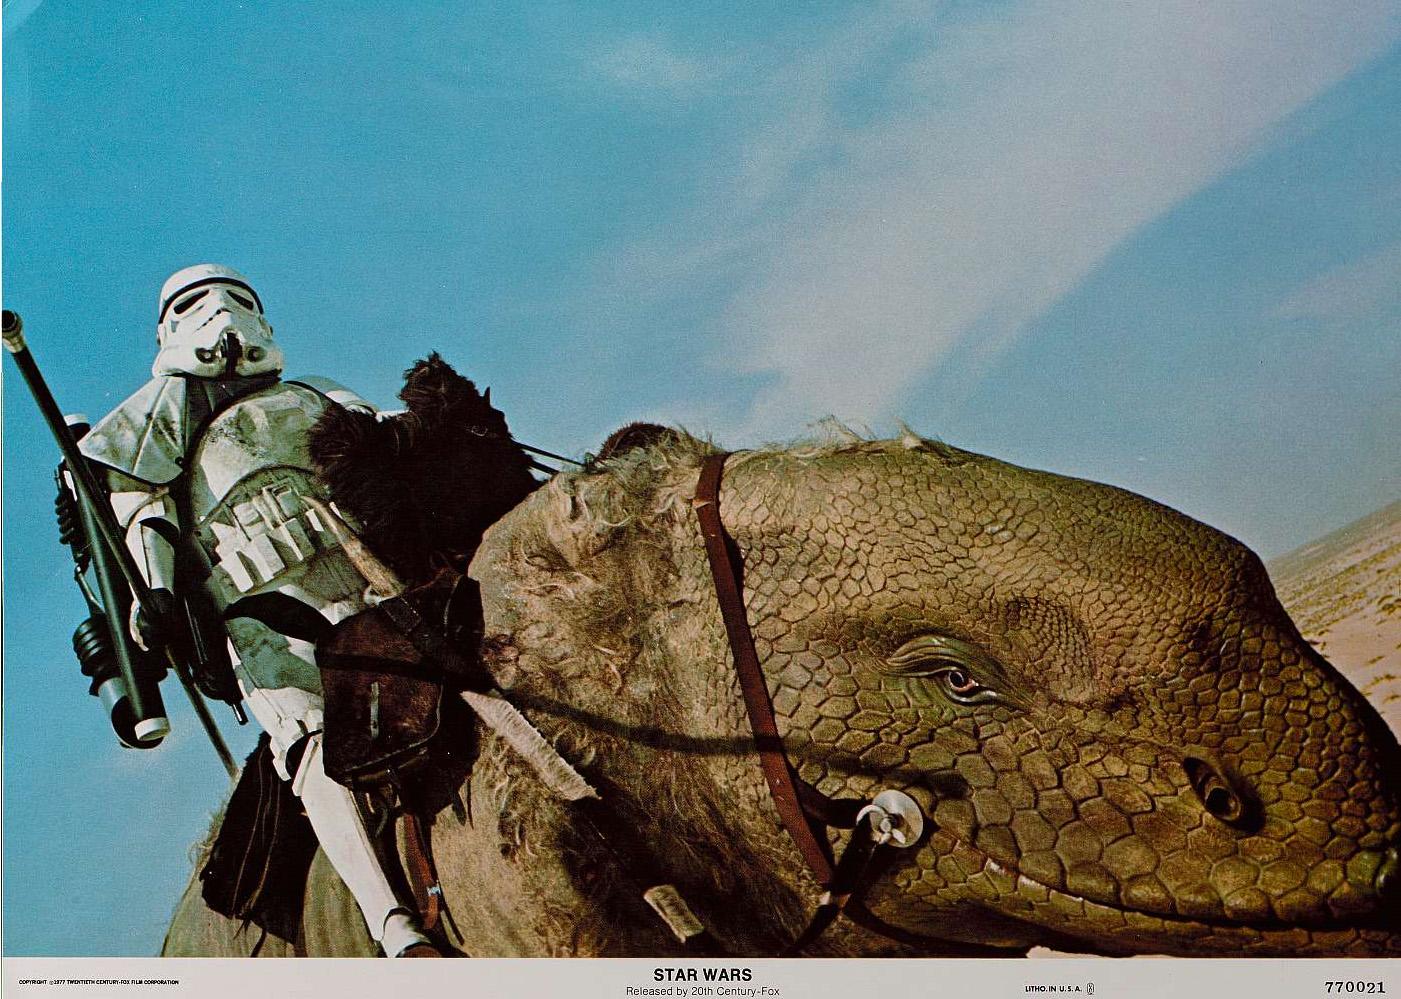 star wars zoology dewback